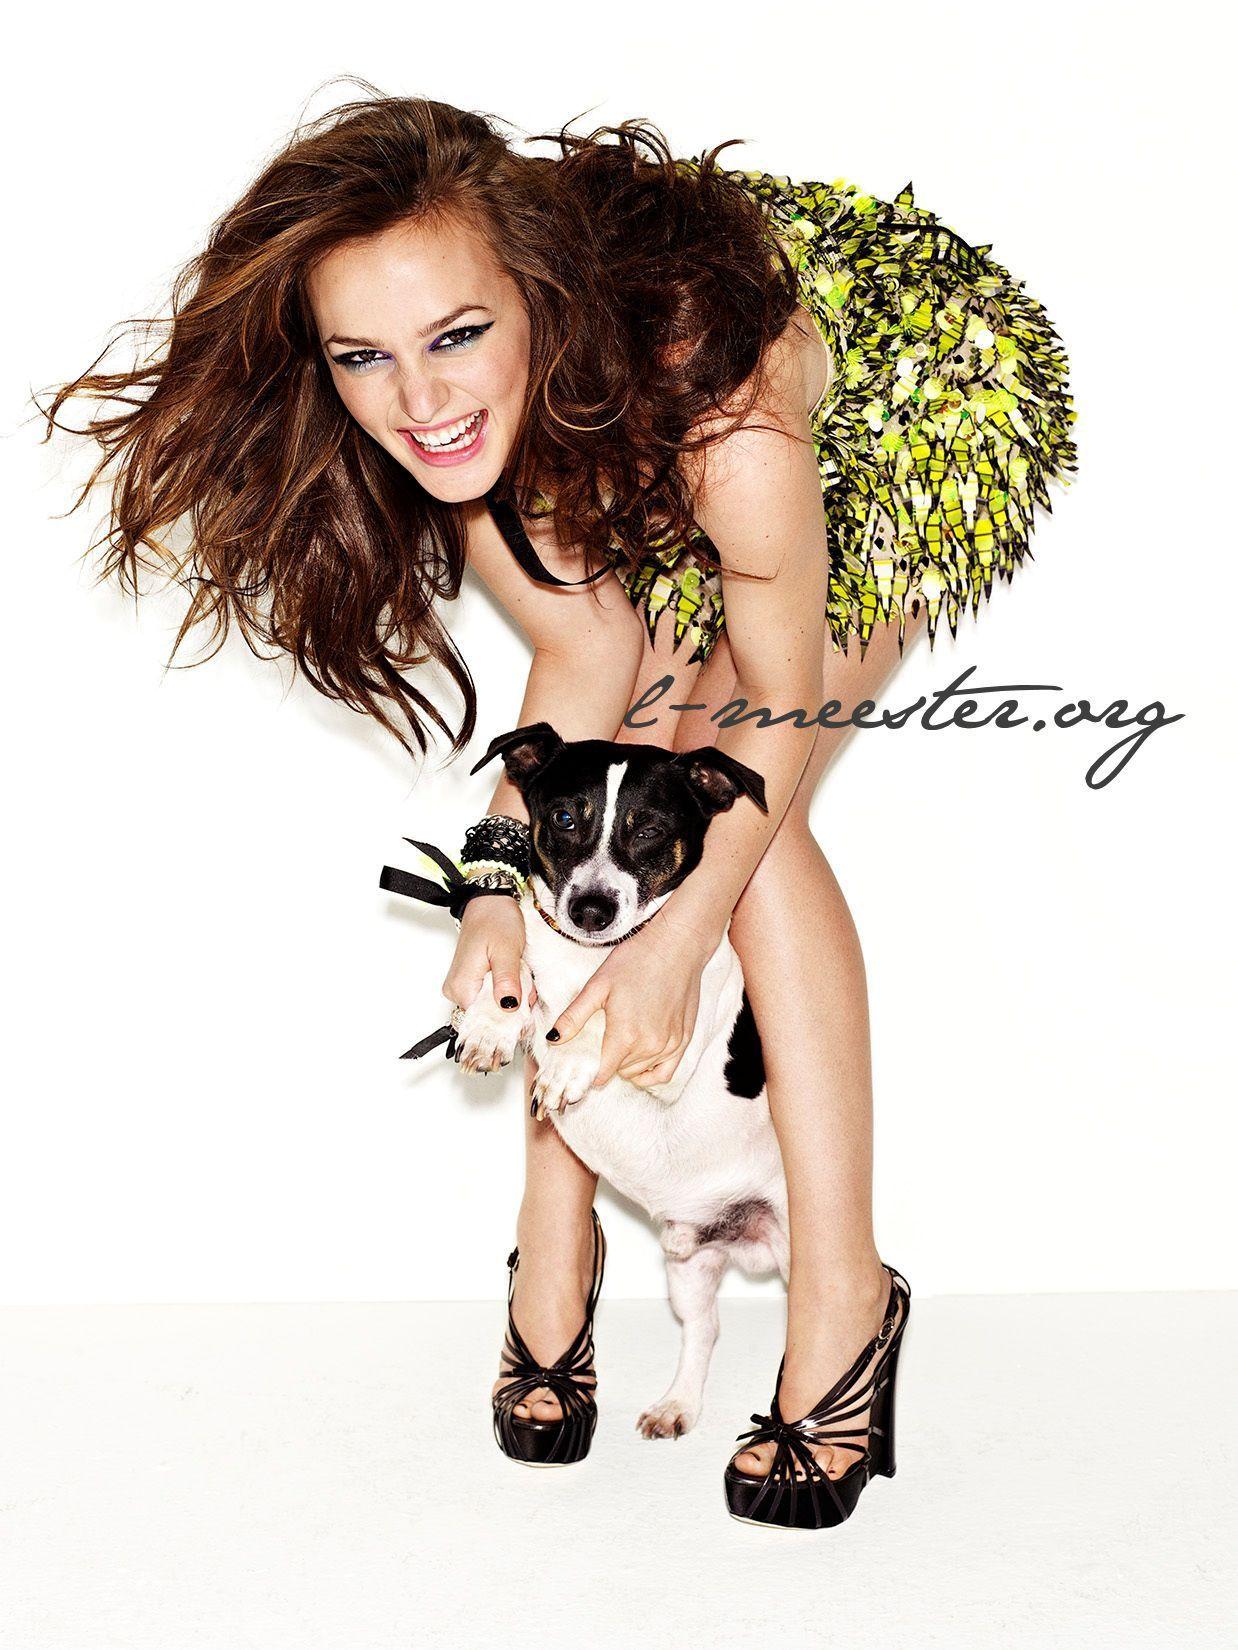 http://images2.fanpop.com/image/photos/13900000/Leighton-Meester-Instyle-UK-Photoshoot-leighton-meester-13941976-1238-1650.jpg